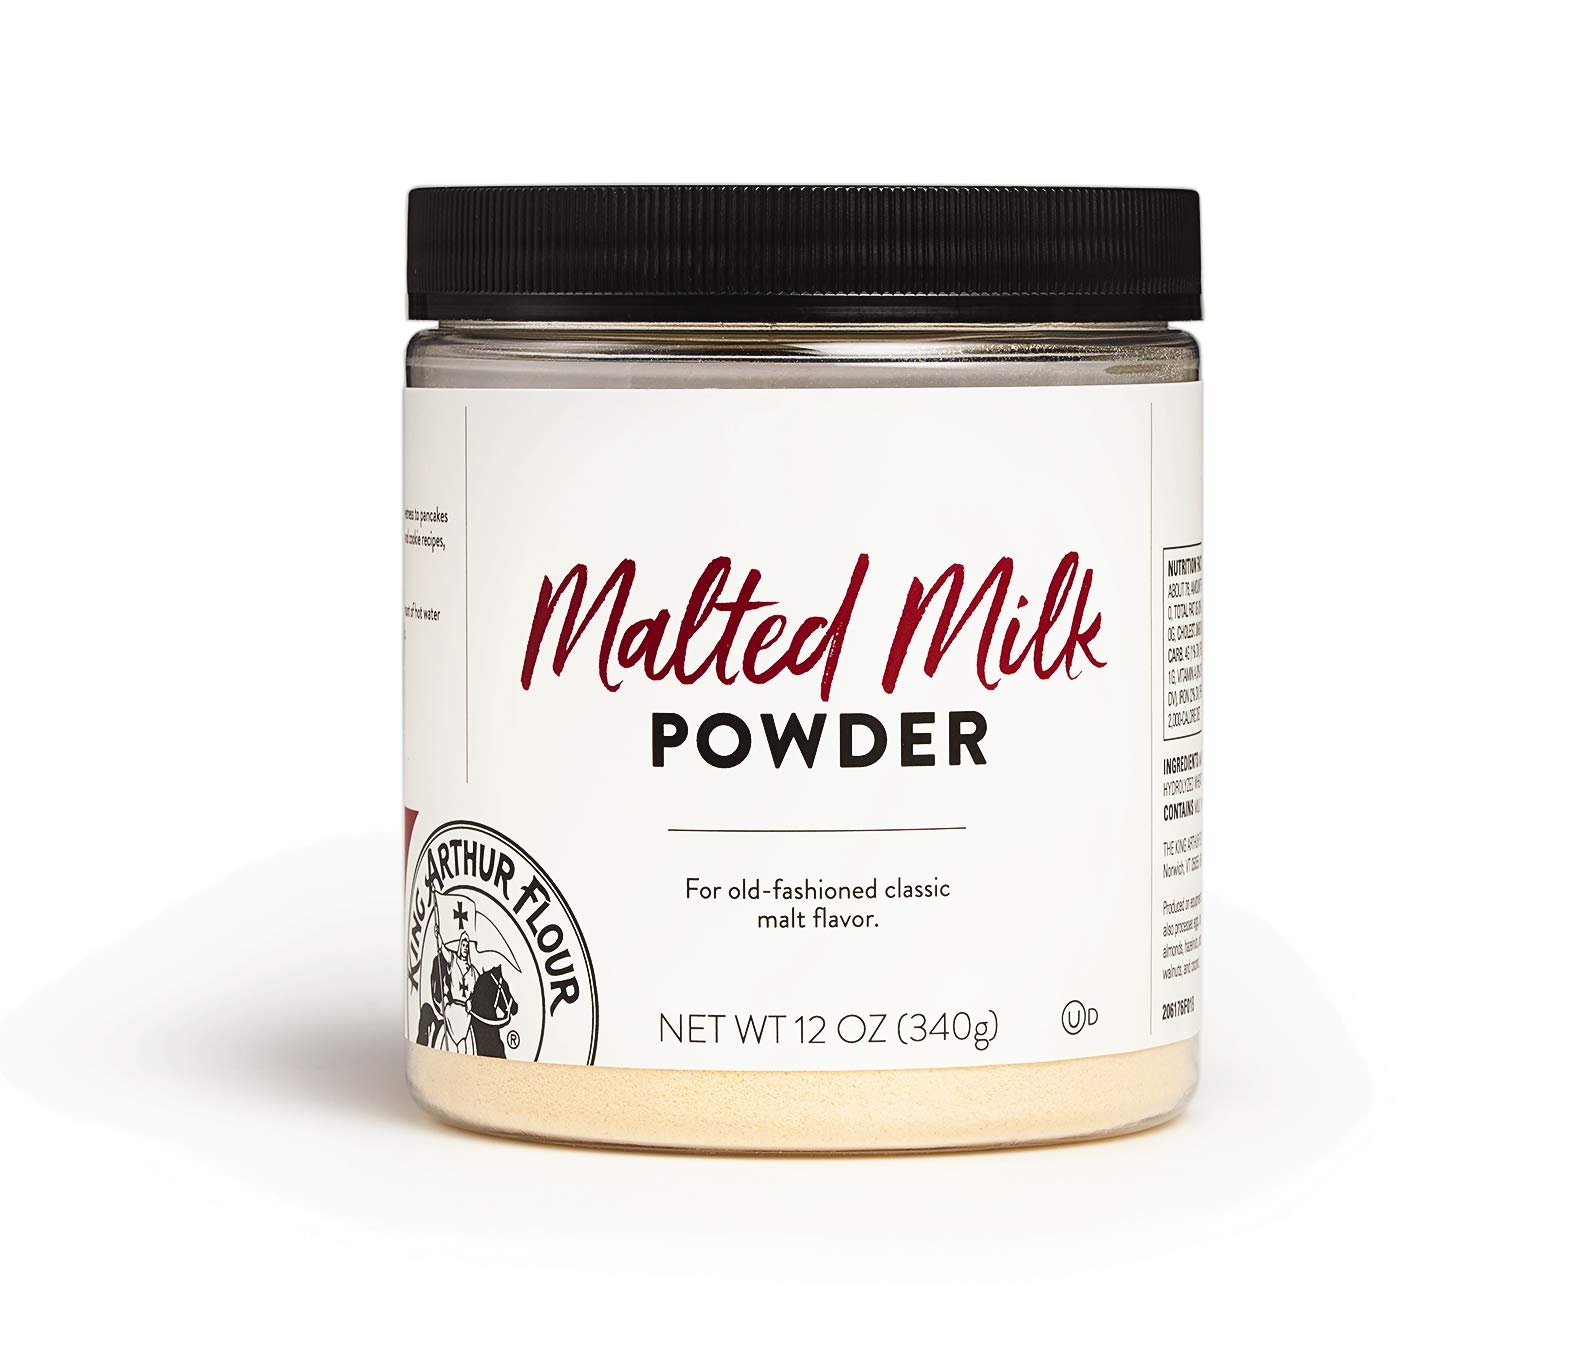 King Arthur Flour Malted Milk Powder, 12 oz by King Arthur Flour